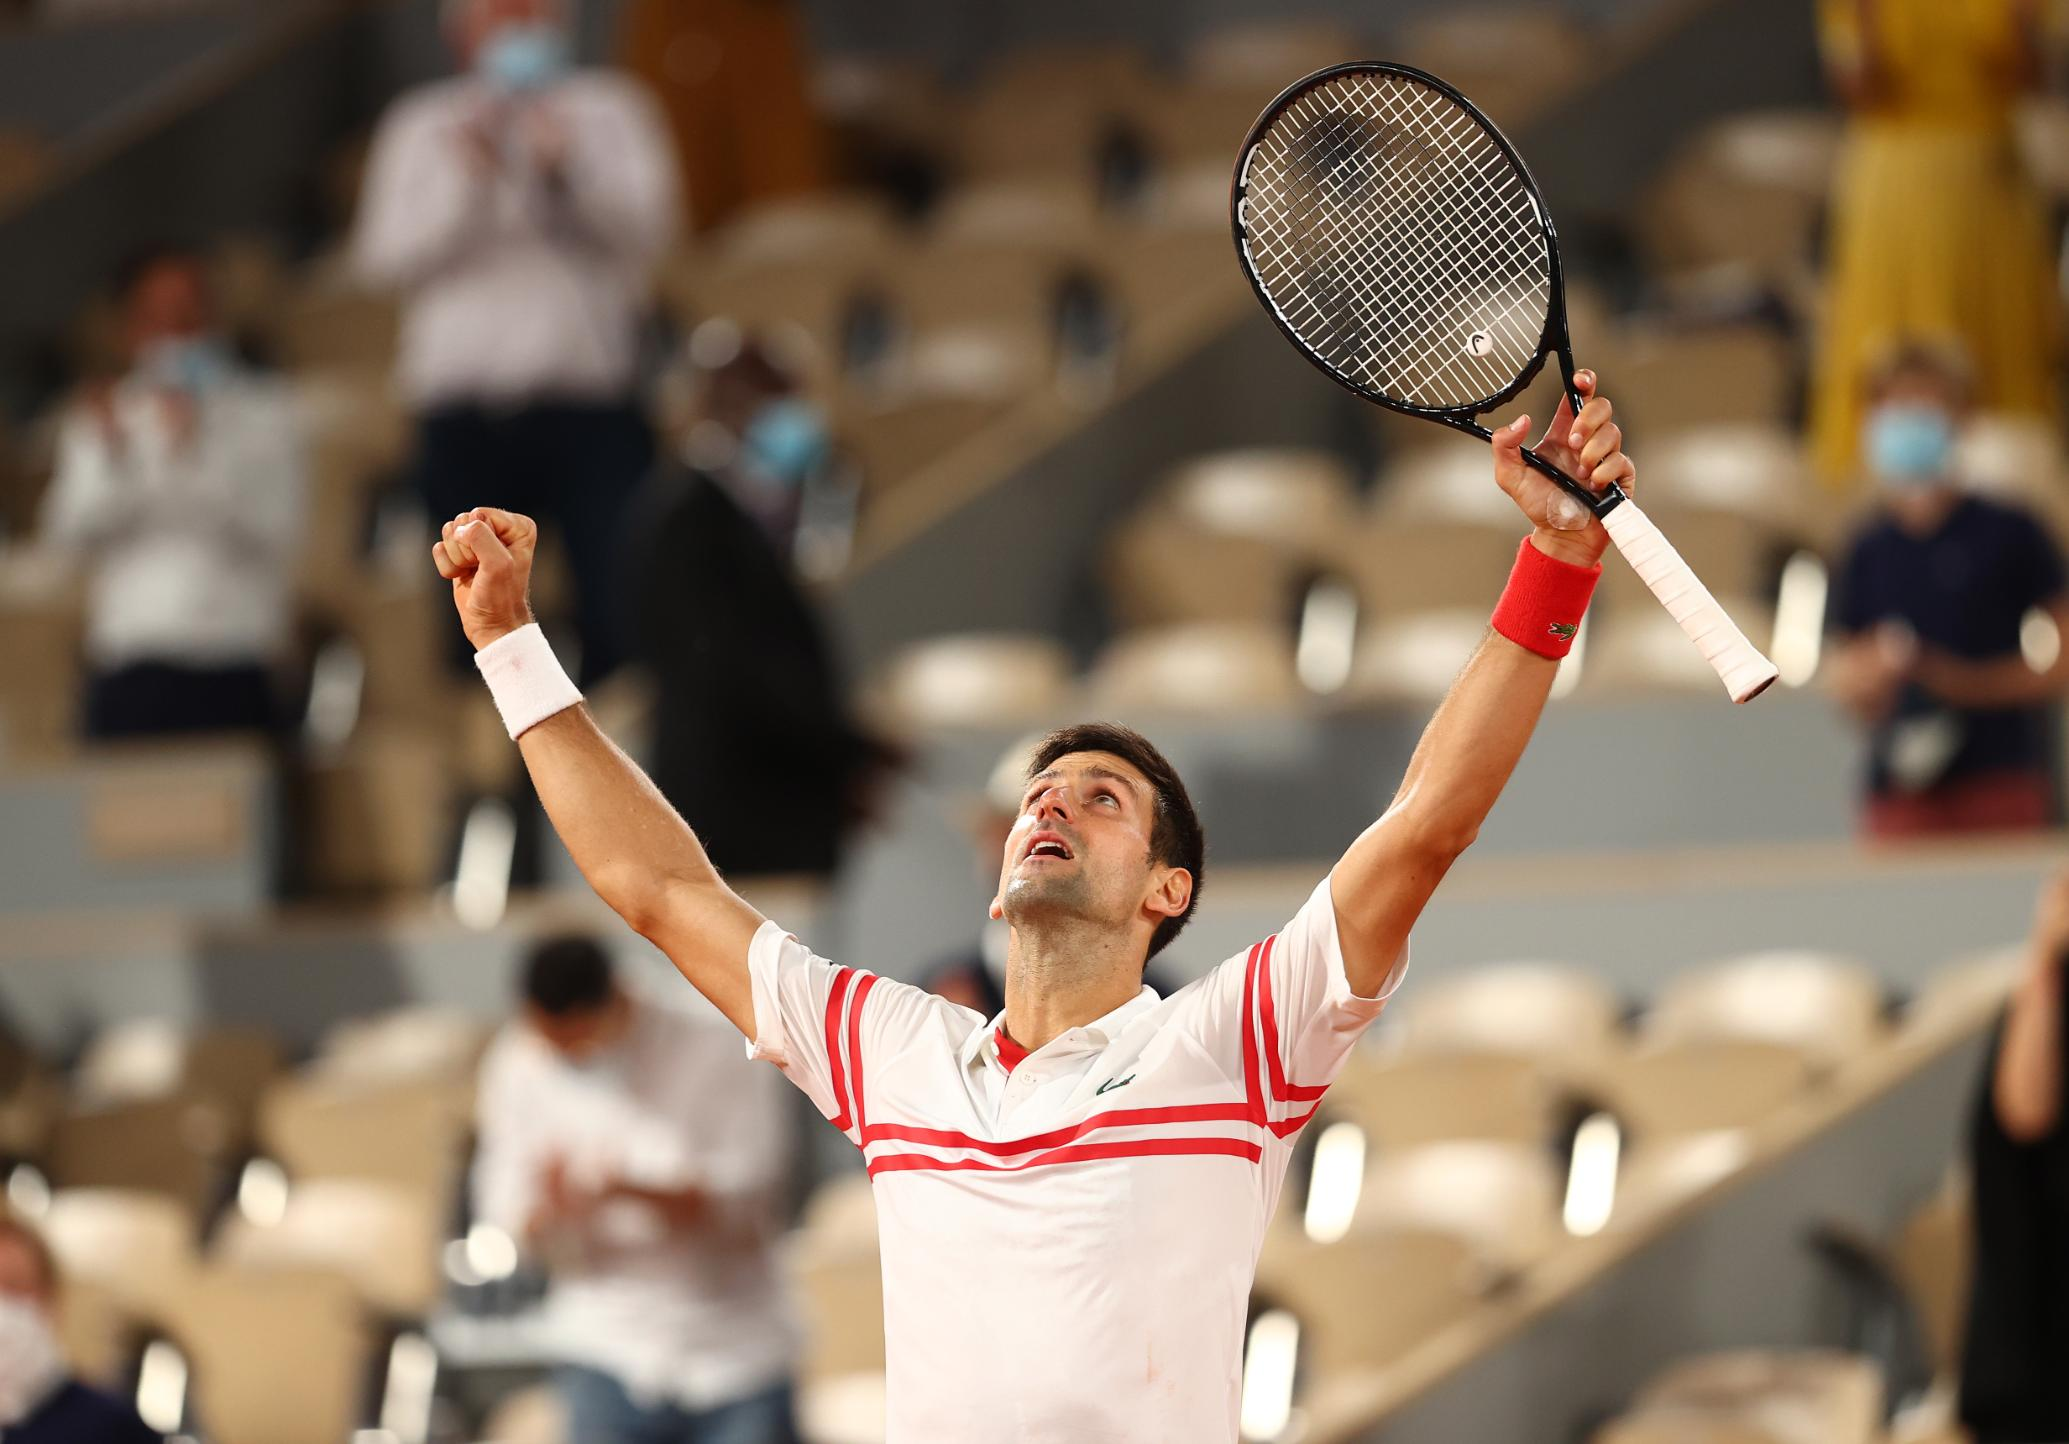 Novak Djokovic beats Rafael Nadal in thriller to reach French Open final